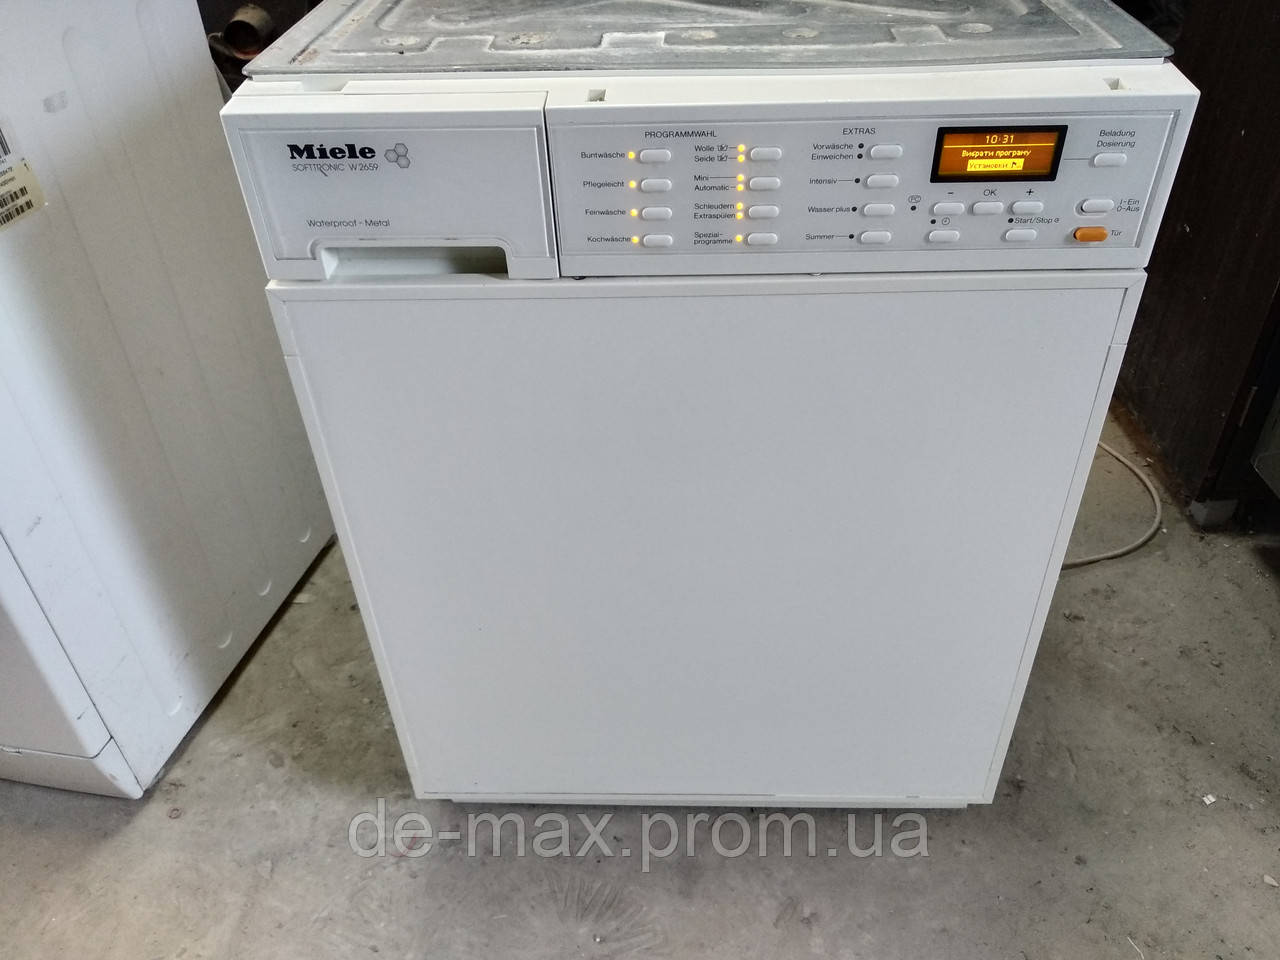 Встраиваемая стиральная машинка Miele W 2659 R WPM 1600об